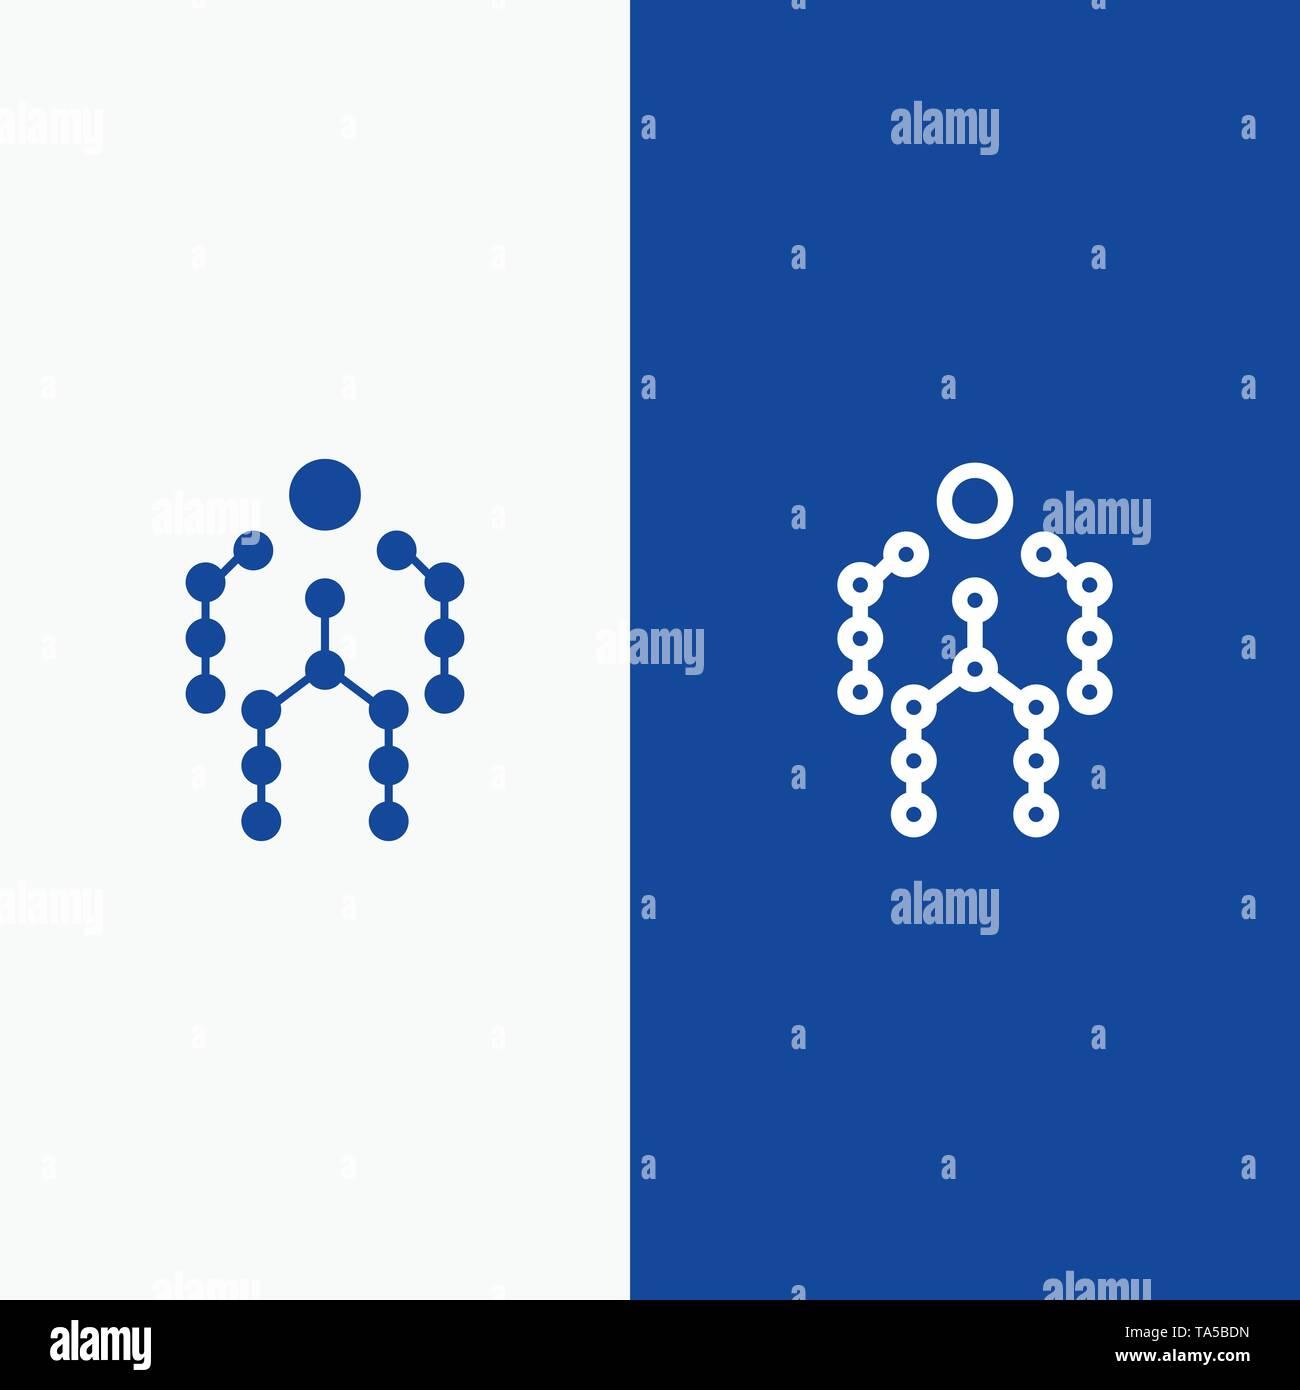 Action, Bones, Capture, Human, Motion Line and Glyph Solid icon Blue banner Line and Glyph Solid icon Blue banner - Stock Image